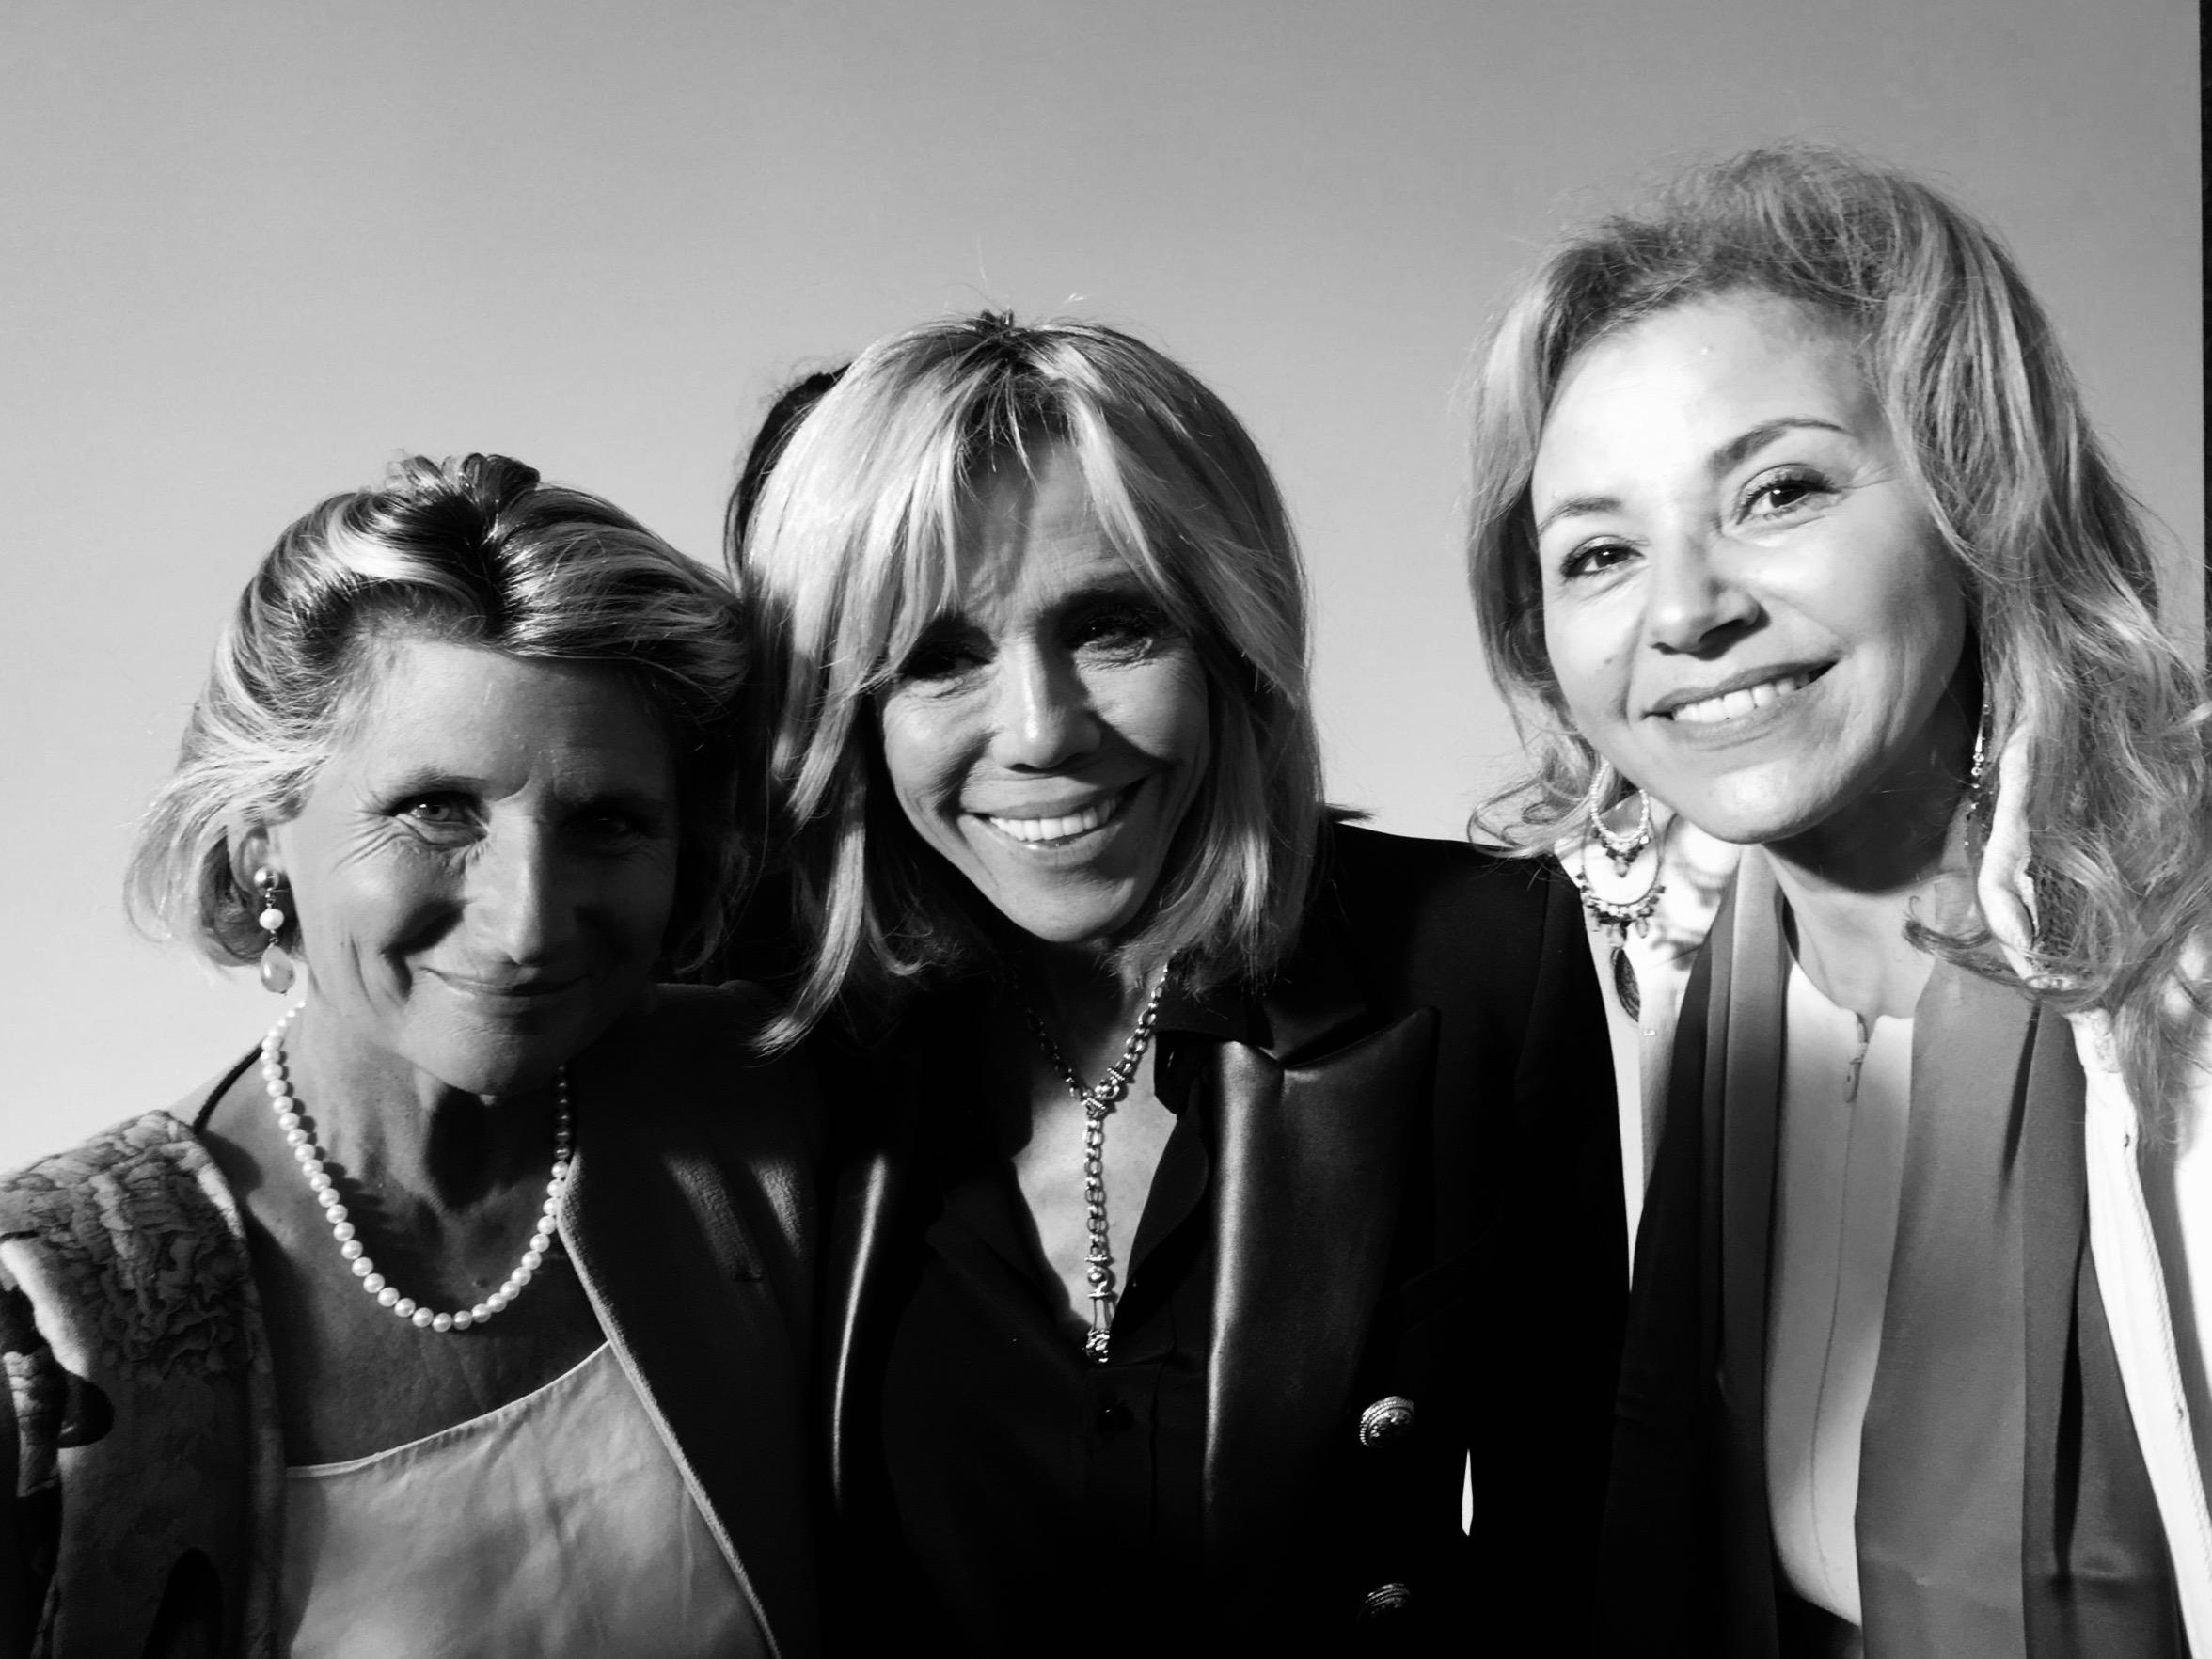 Chiara Corazza, Brigitte Macron et Nora Barsali